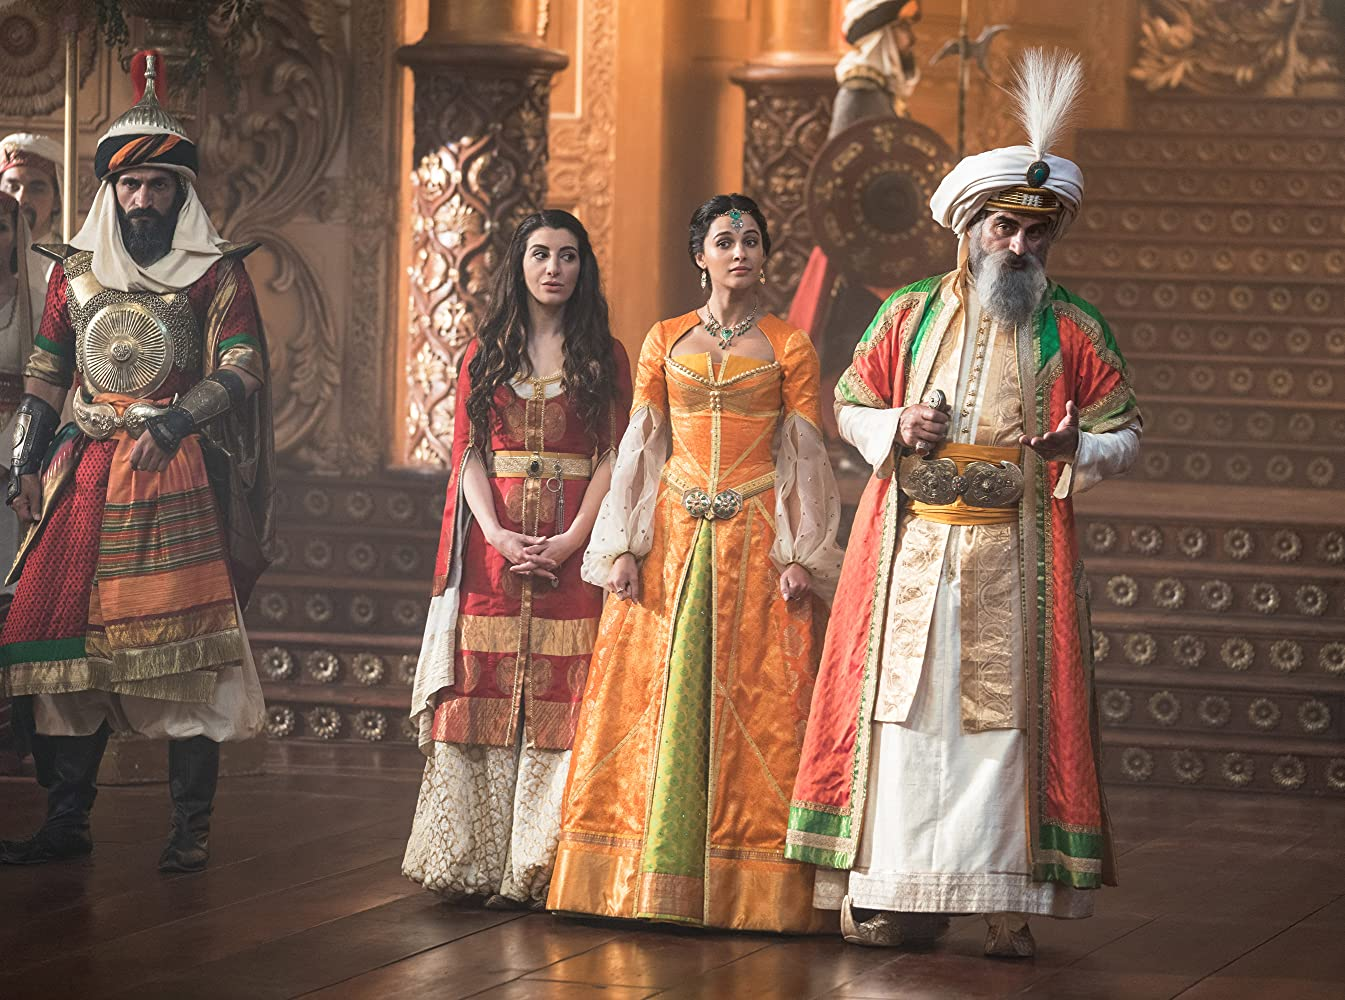 Navid Negahban, Numan Acar, Nasim Pedrad, and Naomi Scott in Aladdin (2019)